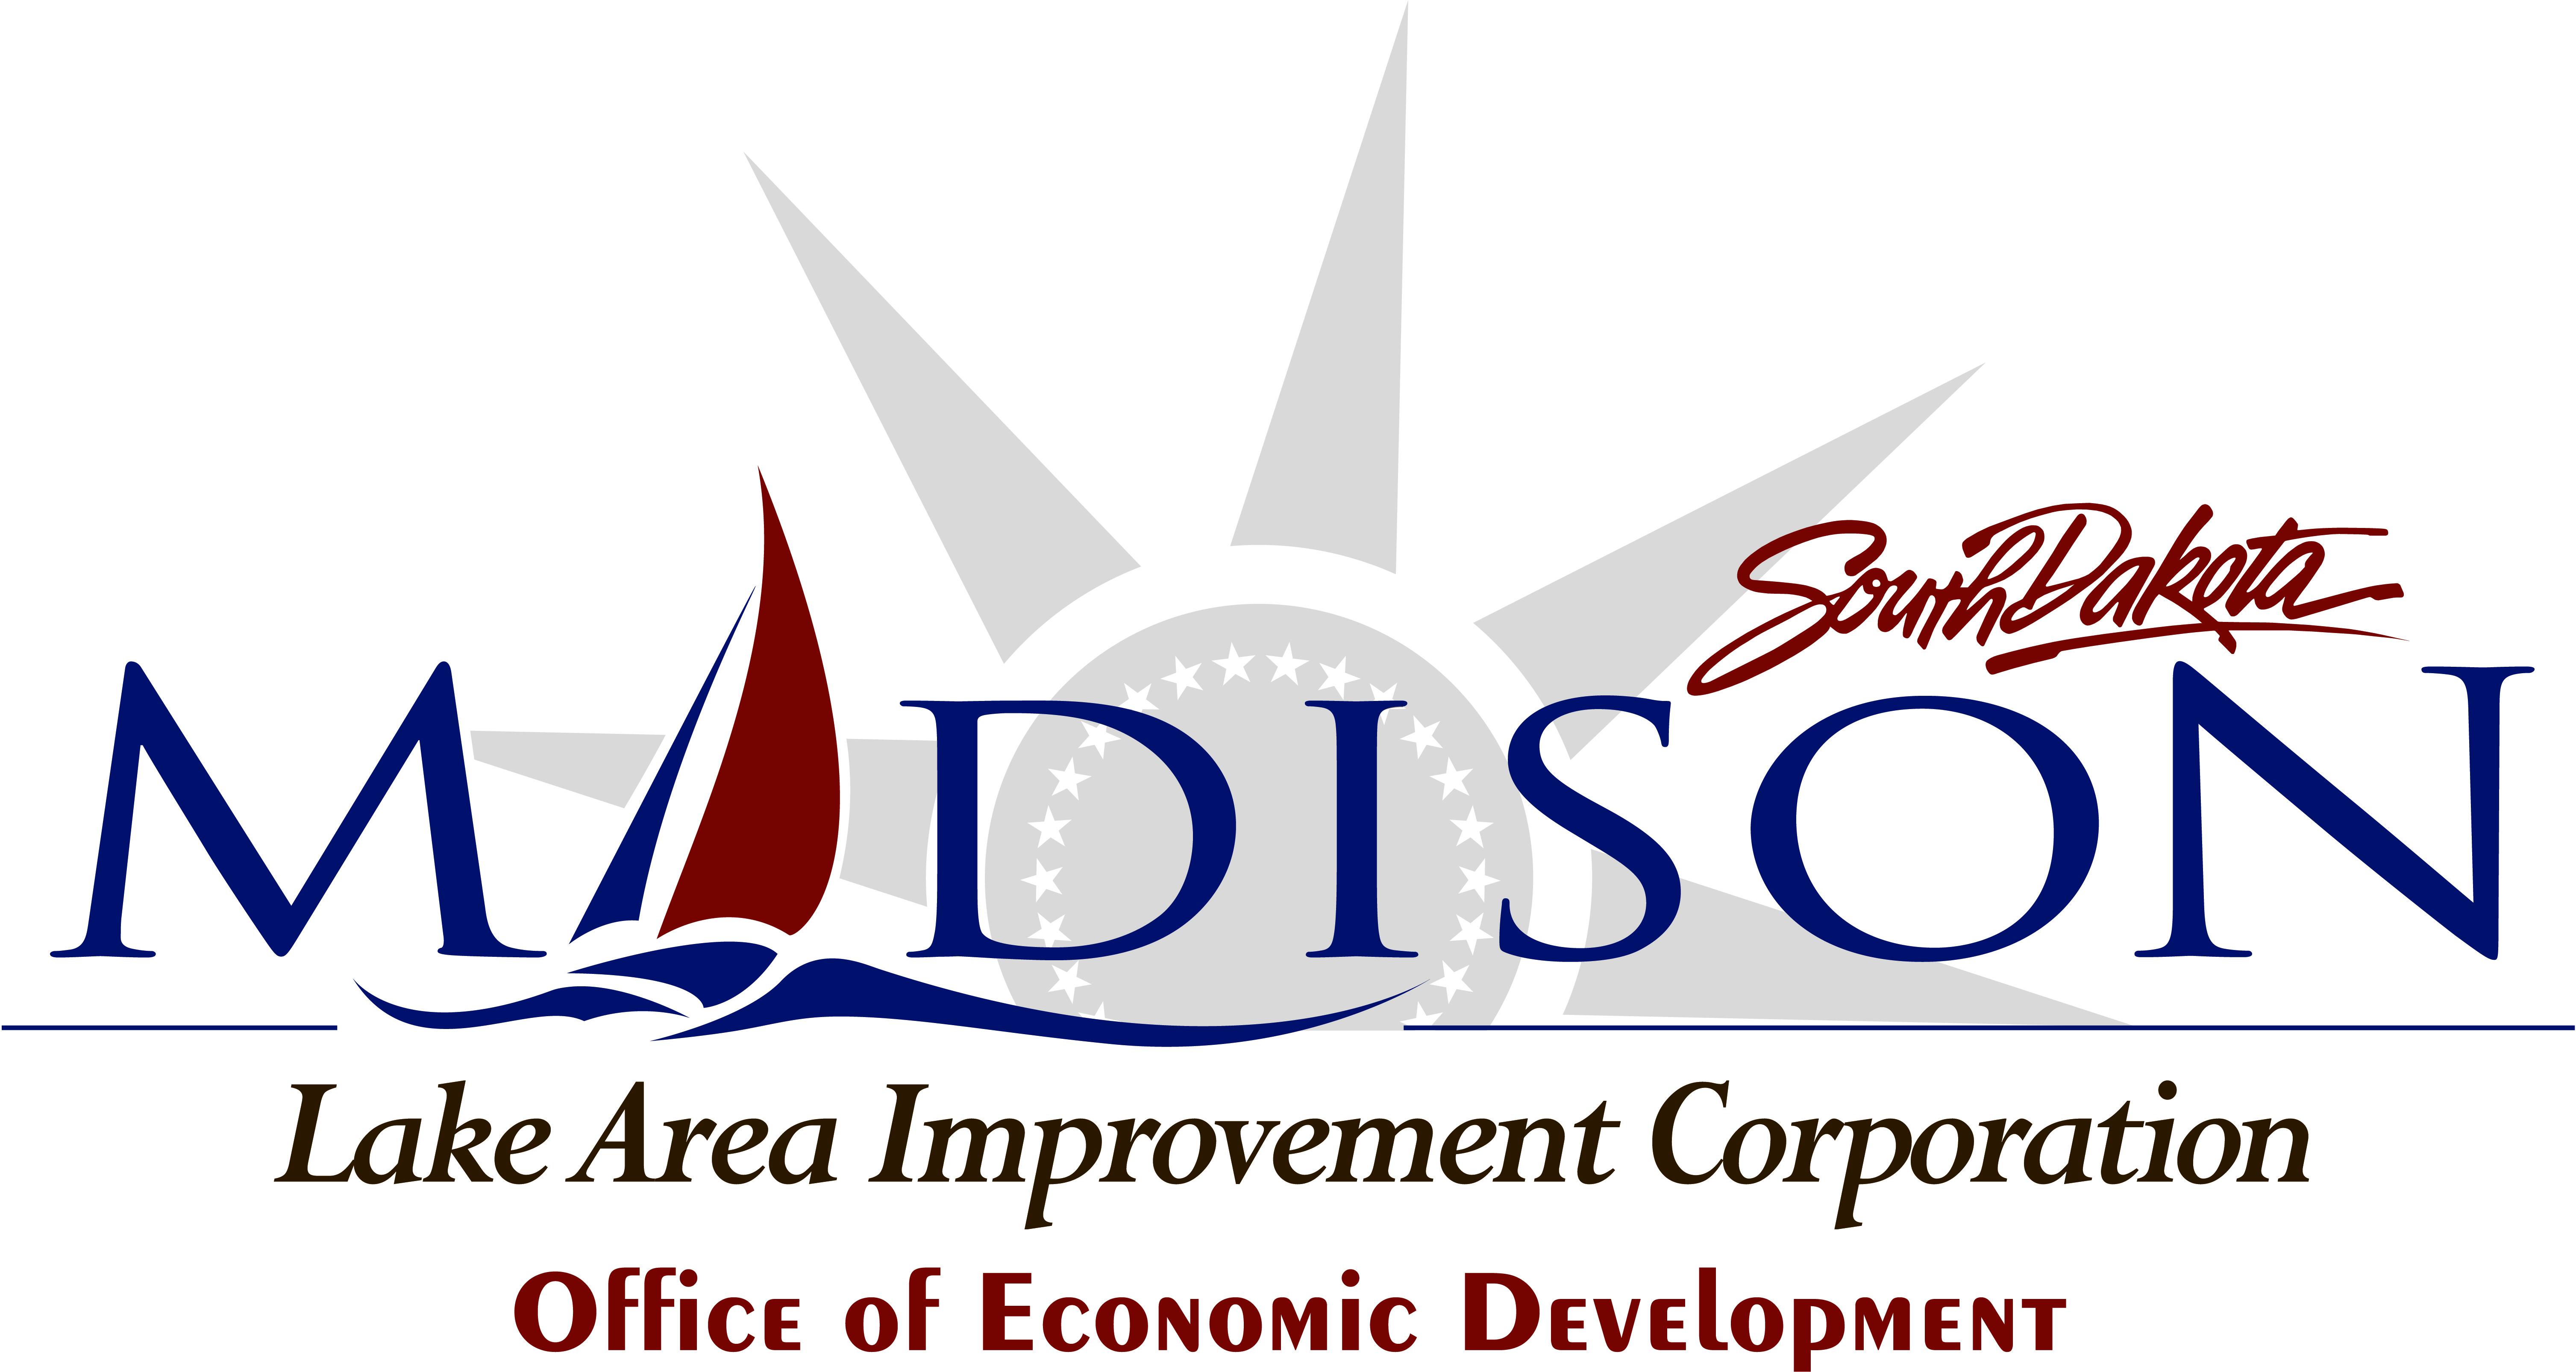 https://growthzonesitesprod.azureedge.net/wp-content/uploads/sites/1494/2020/04/LAIC-OED-logo2.jpg